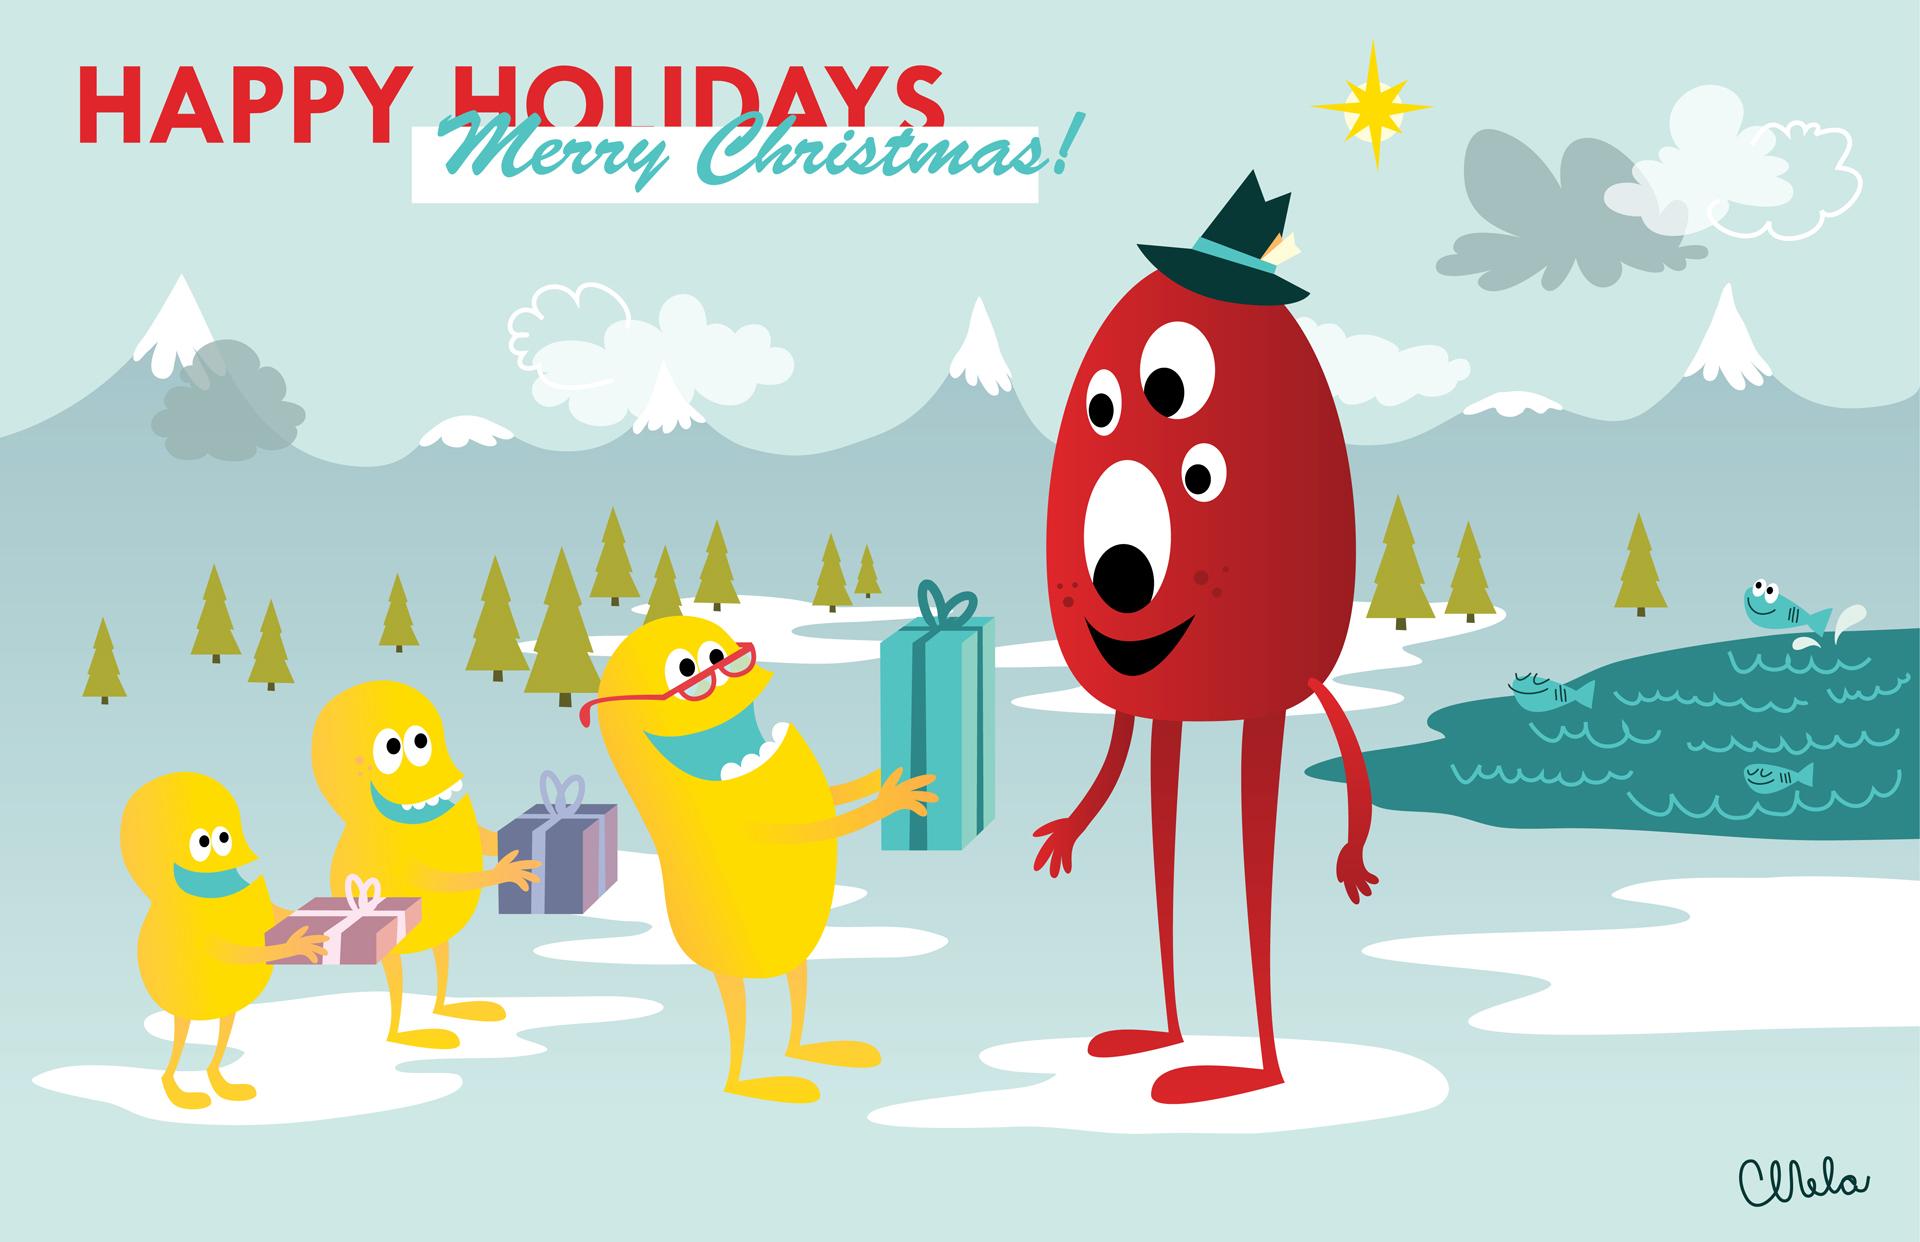 merry_christmas_cvela_web_large.jpg